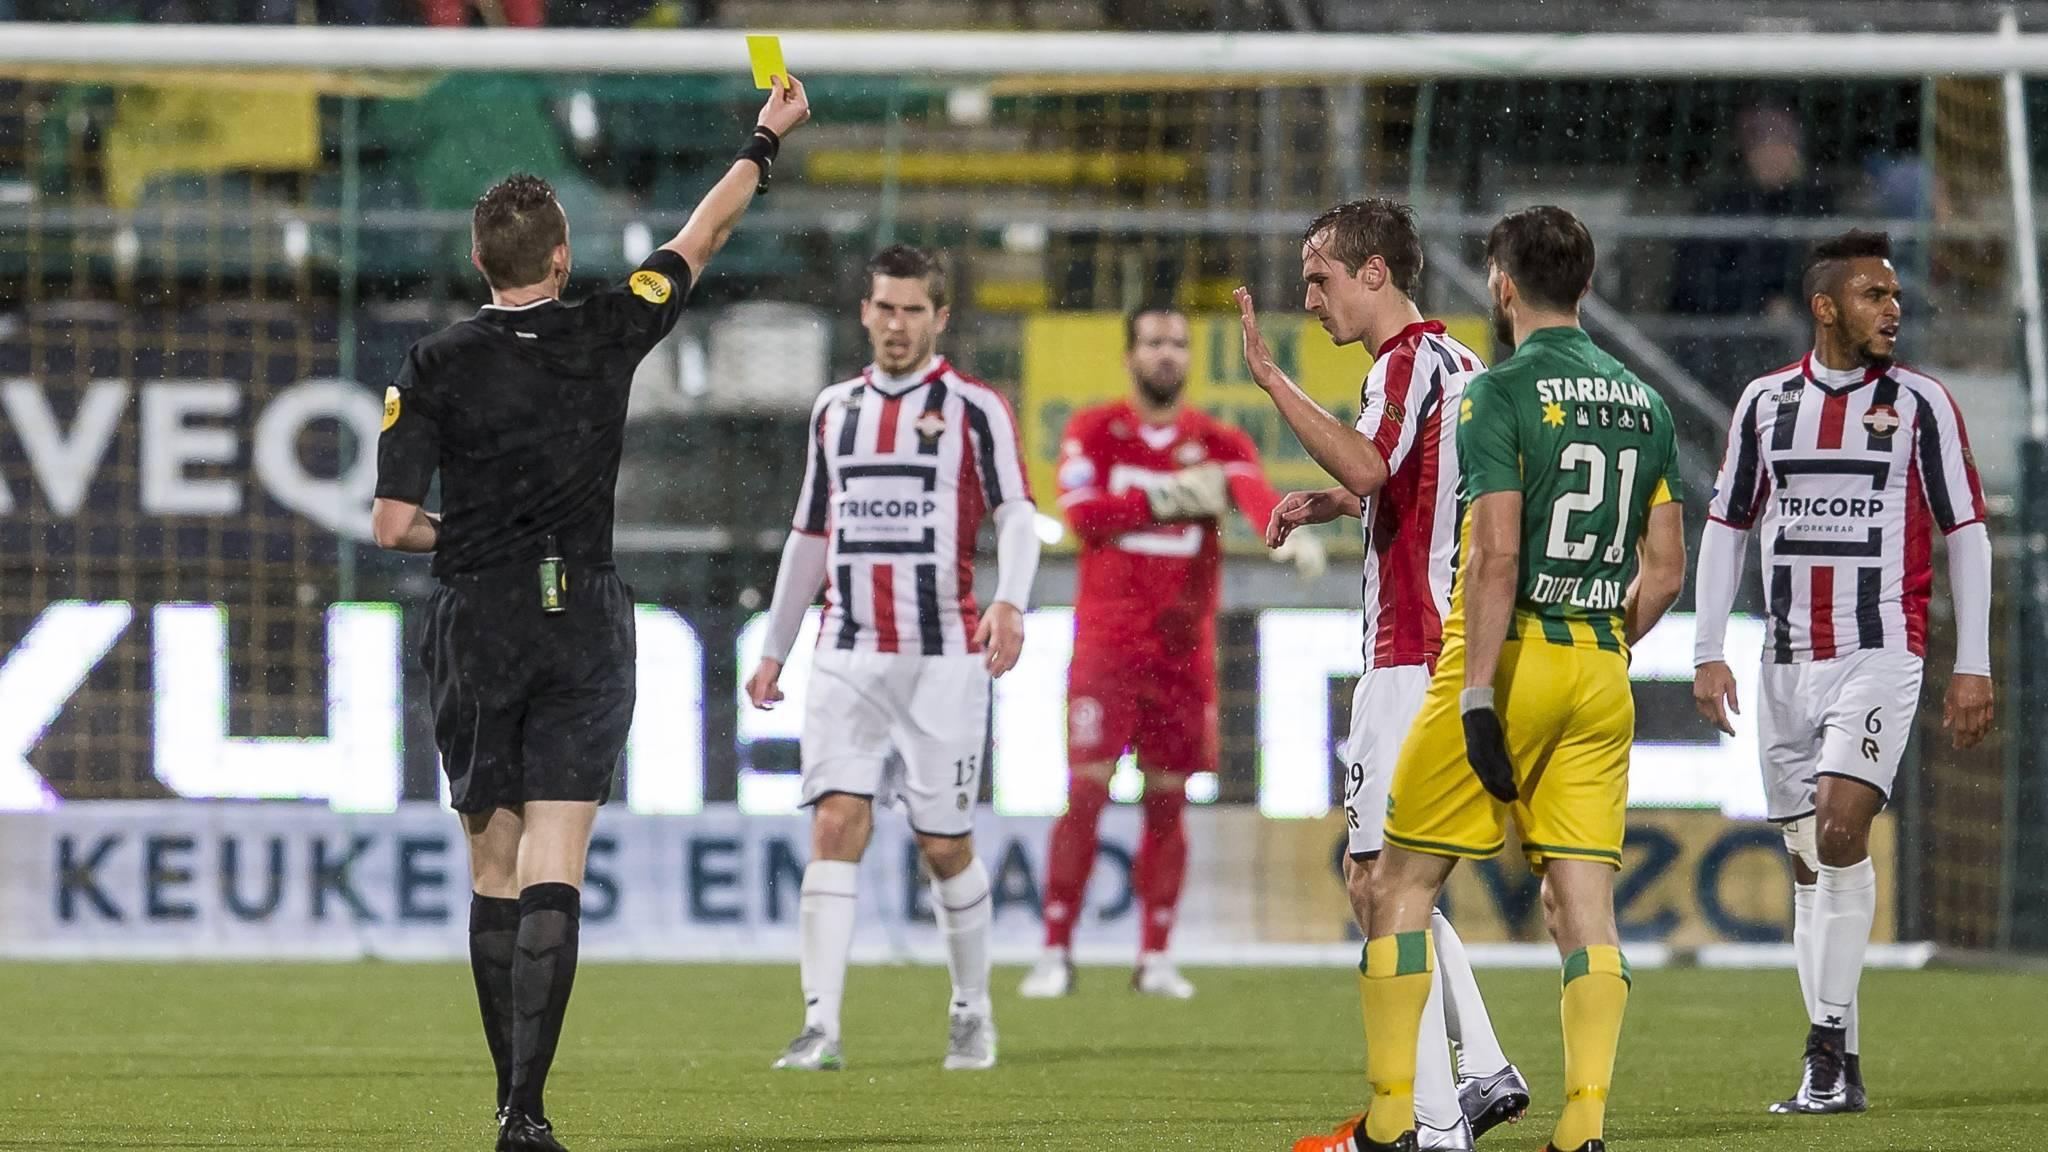 Ado   Willem Ii: Scheidsrechter Lindhout Na ADO-Willem II